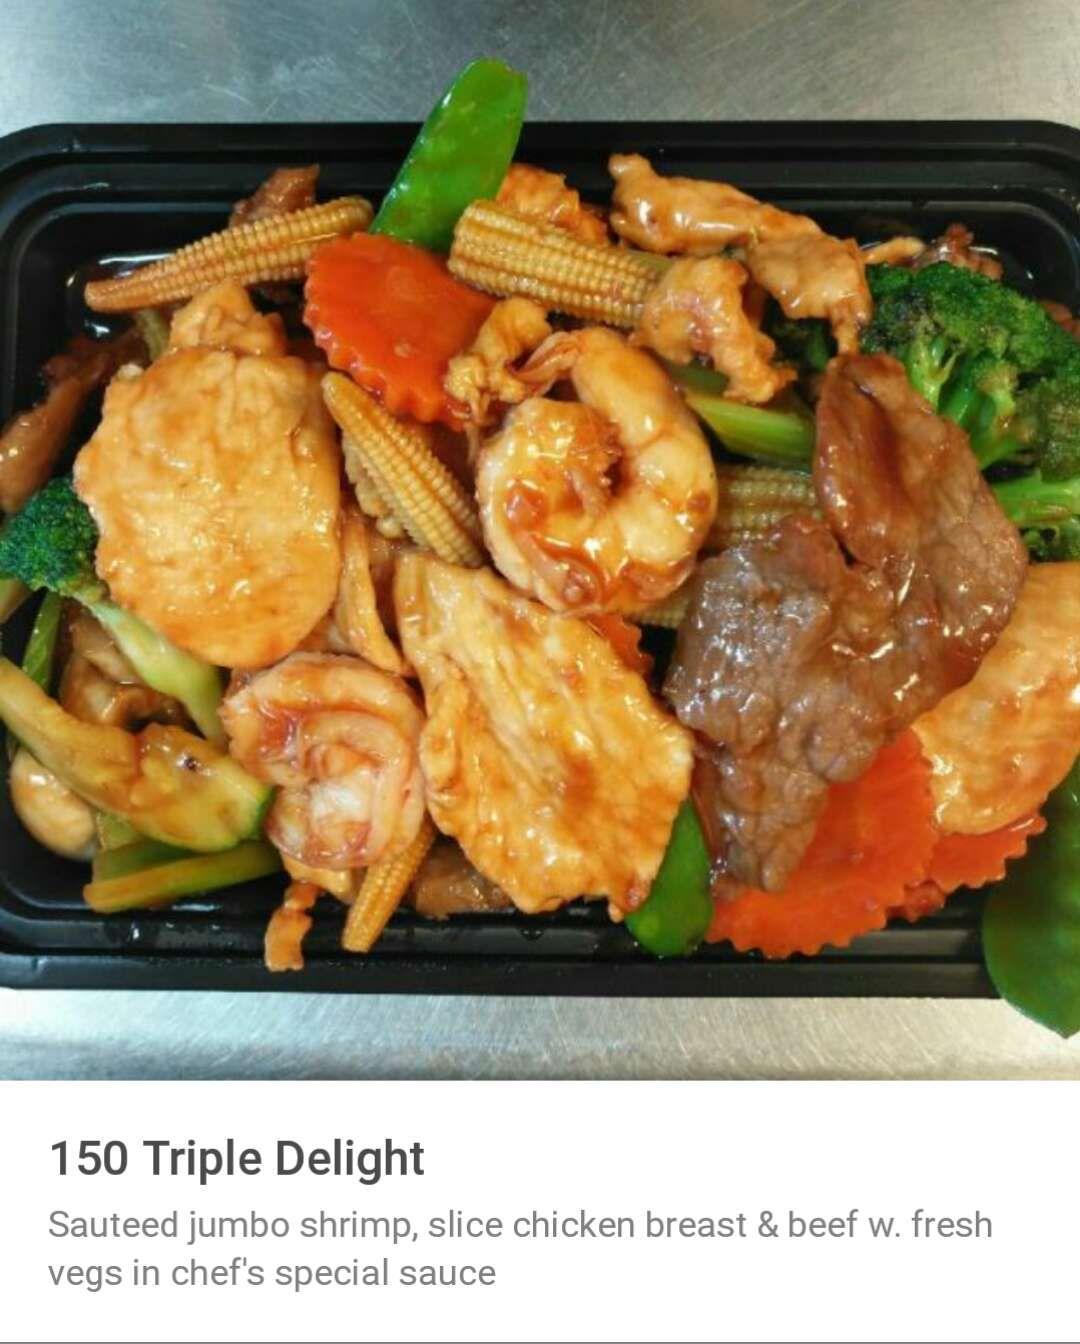 150. Triple Delight Image